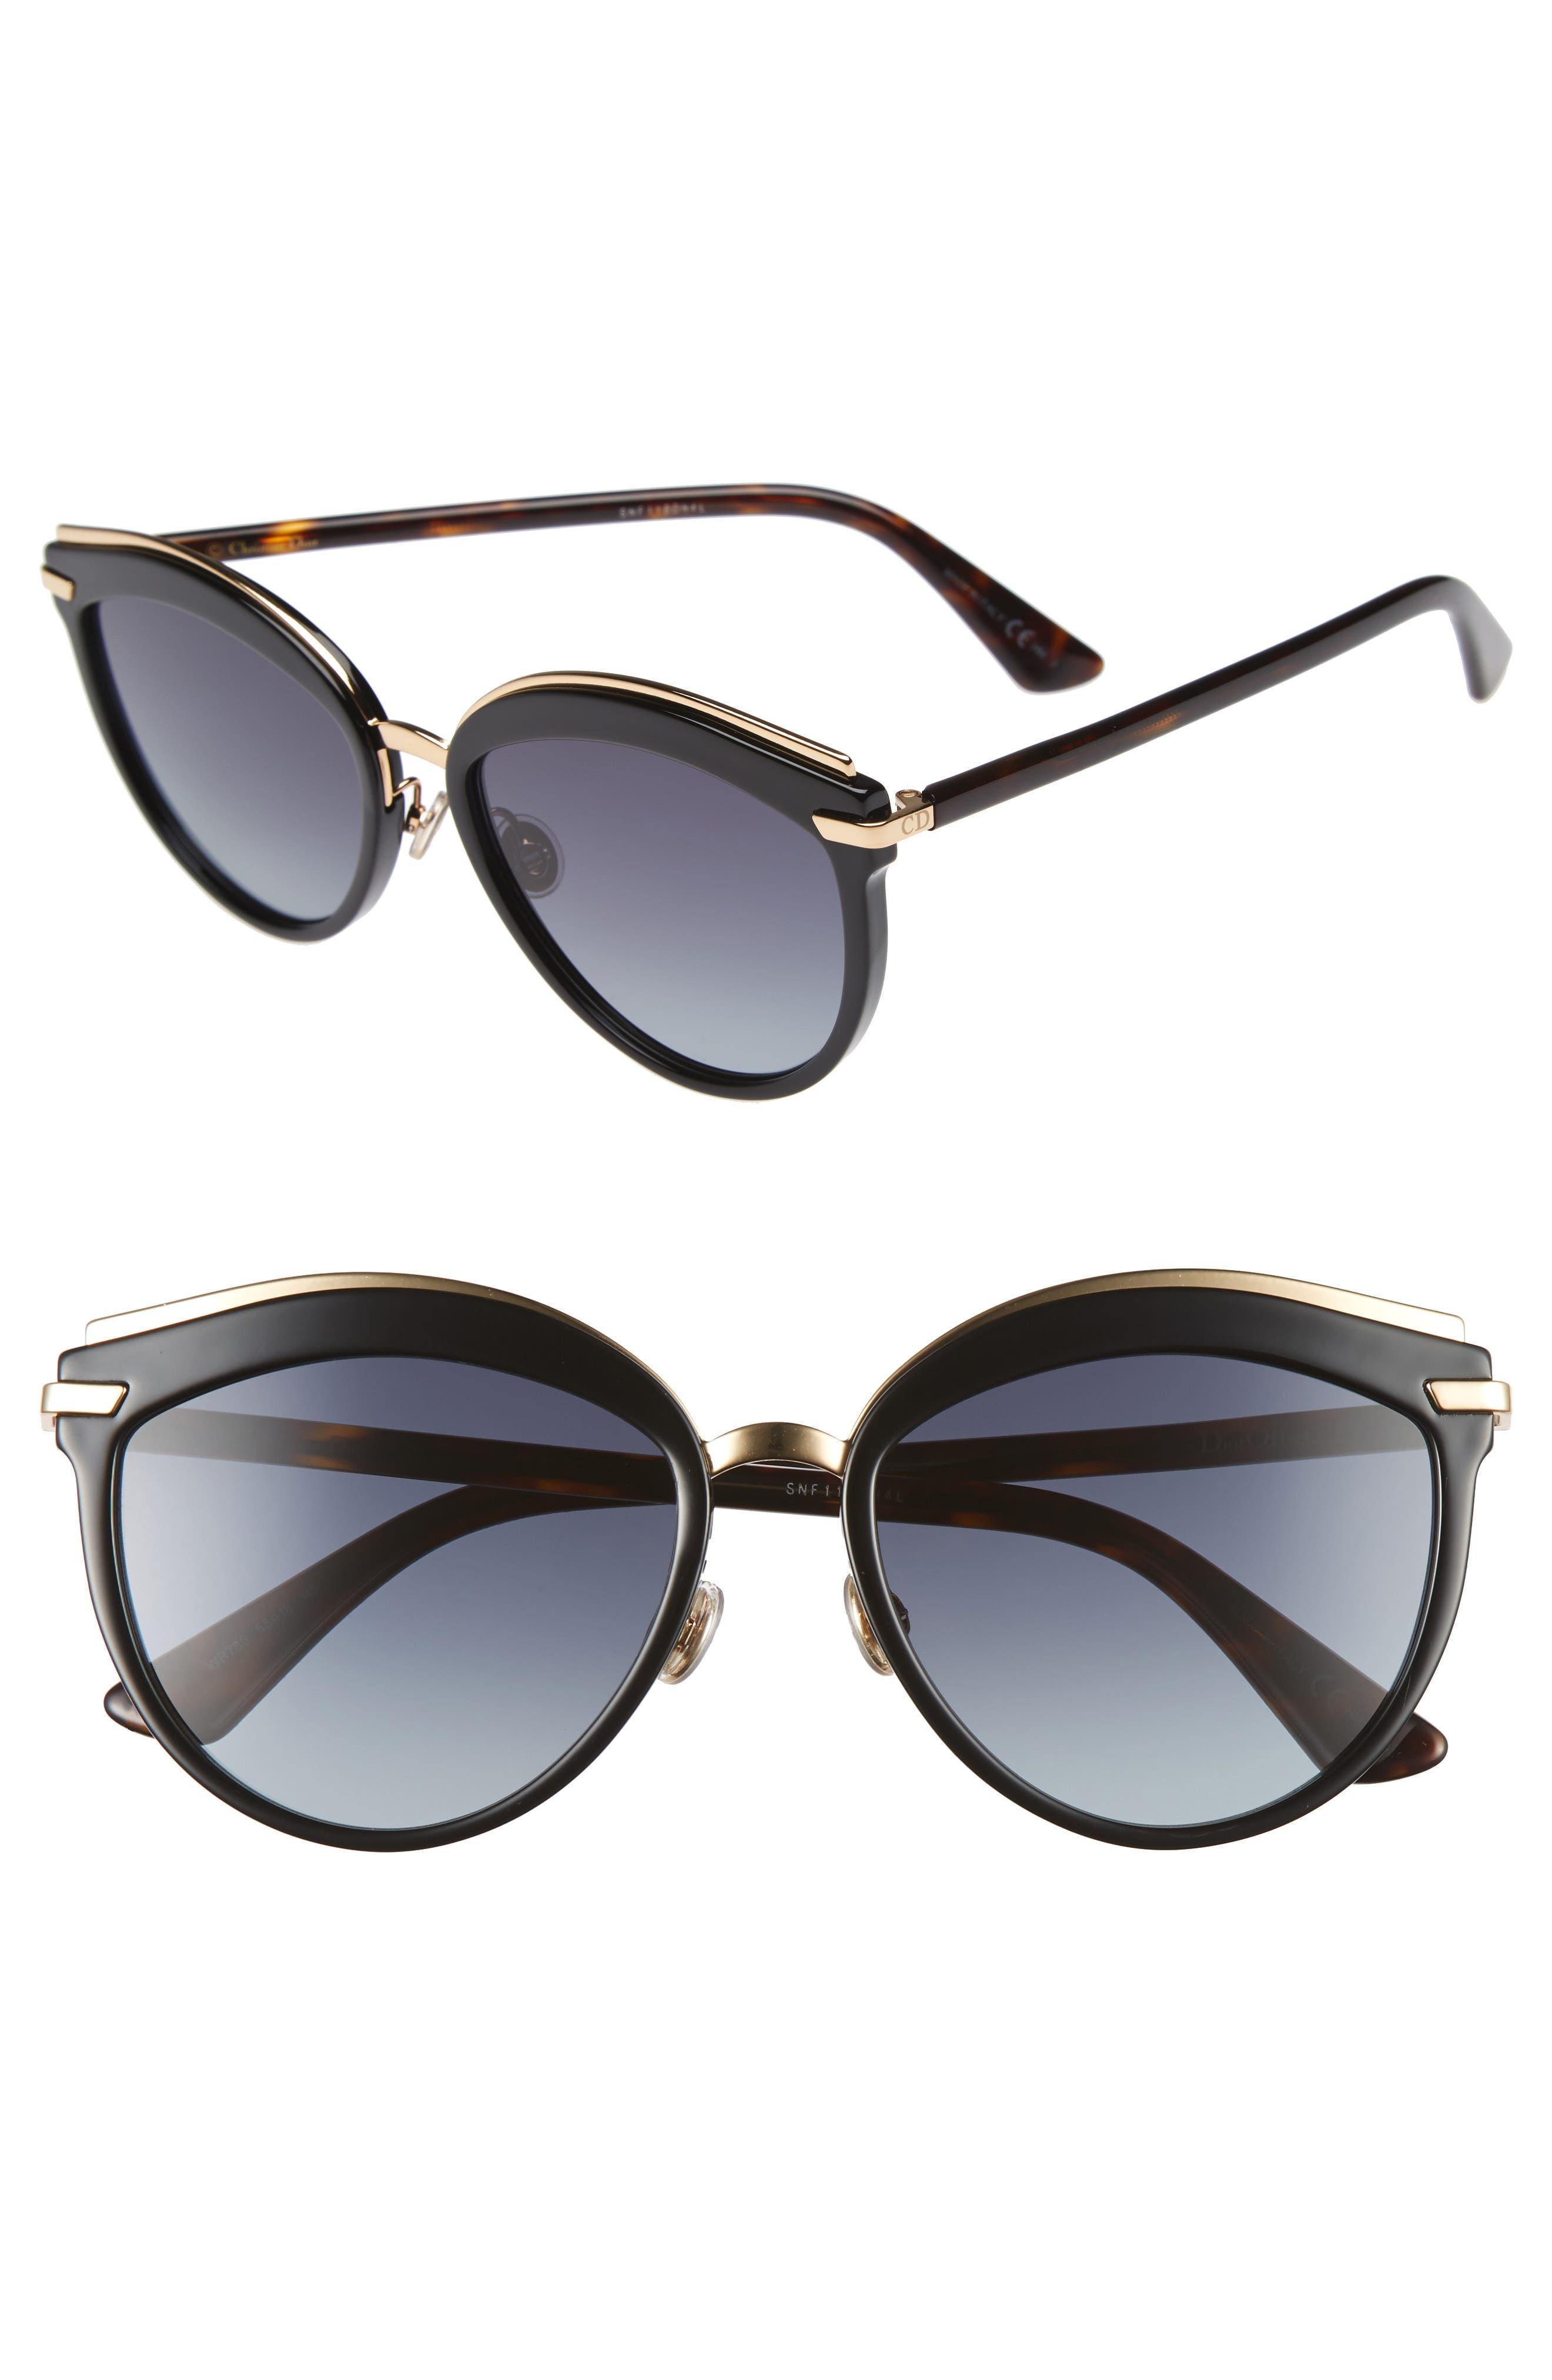 Offset 2 55mm Sunglasses,                             Main thumbnail 1, color,                             001